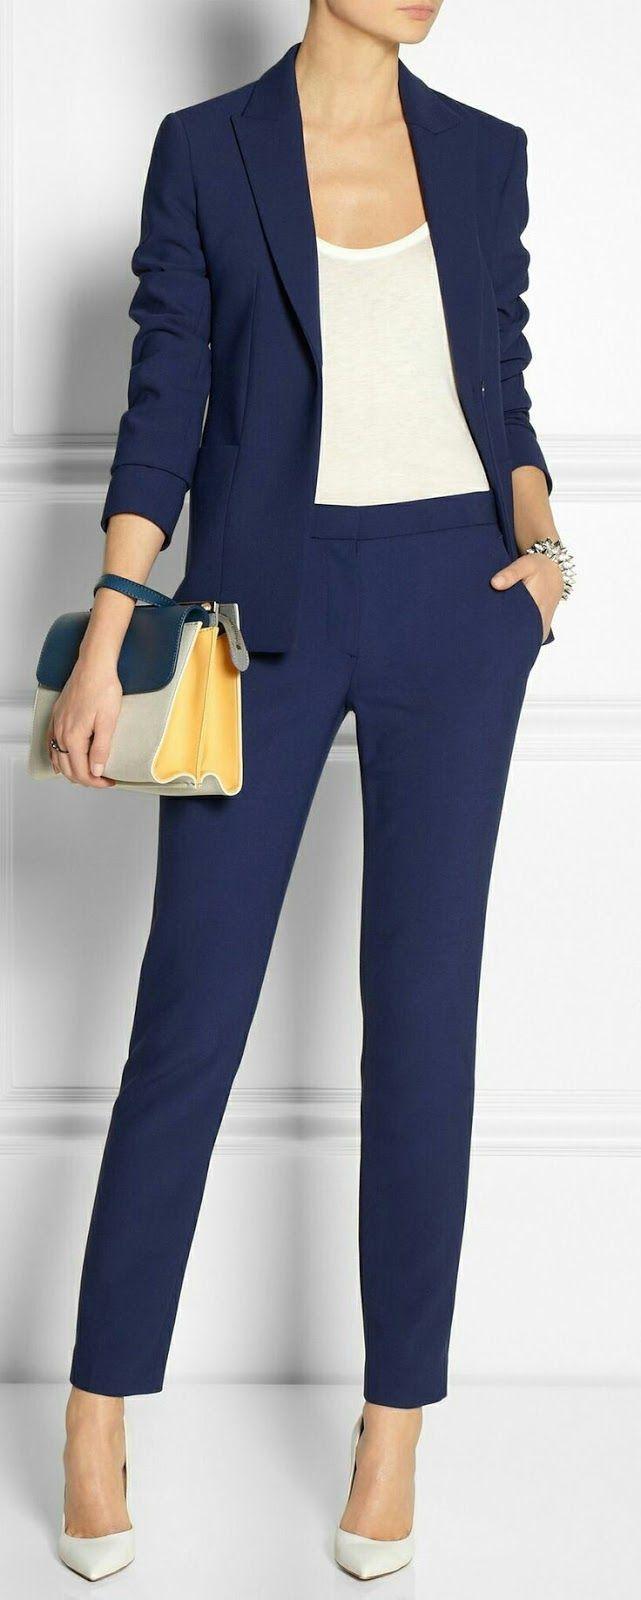 nice Business men style Fαshiση Gαlαxy 98 ☯ by http://www.dezdemonfashiontrends.top/fashion-designers/business-men-style-f%ce%b1shi%cf%83%ce%b7-g%ce%b1l%ce%b1xy-98-%e2%98%af/